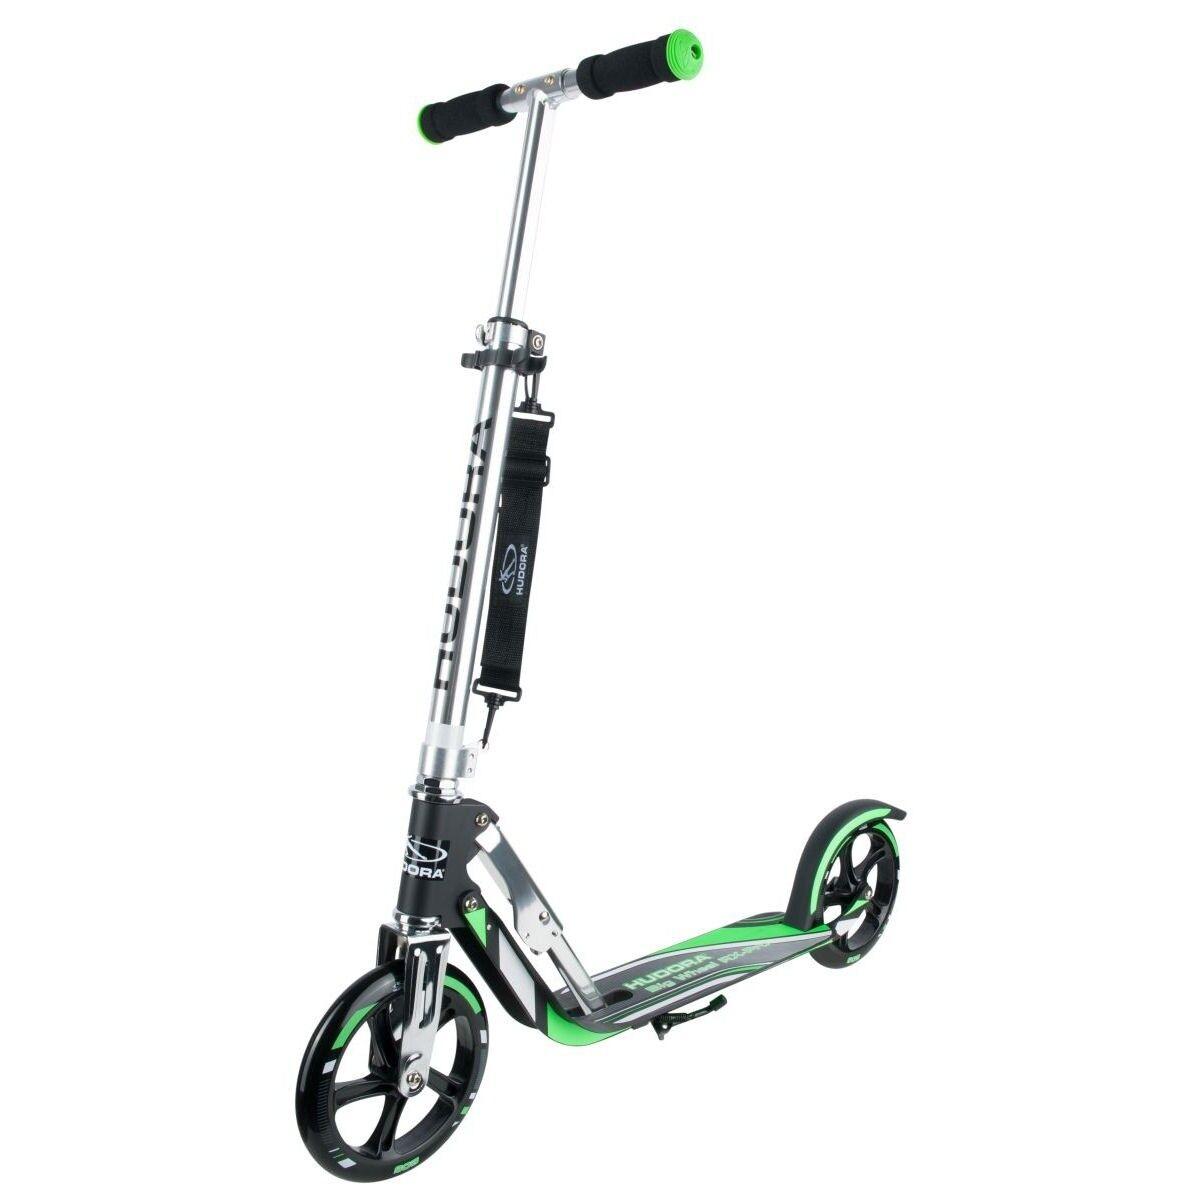 Hudora Big Wheel RX-Pro 205 Roller Scooter schwarz grün